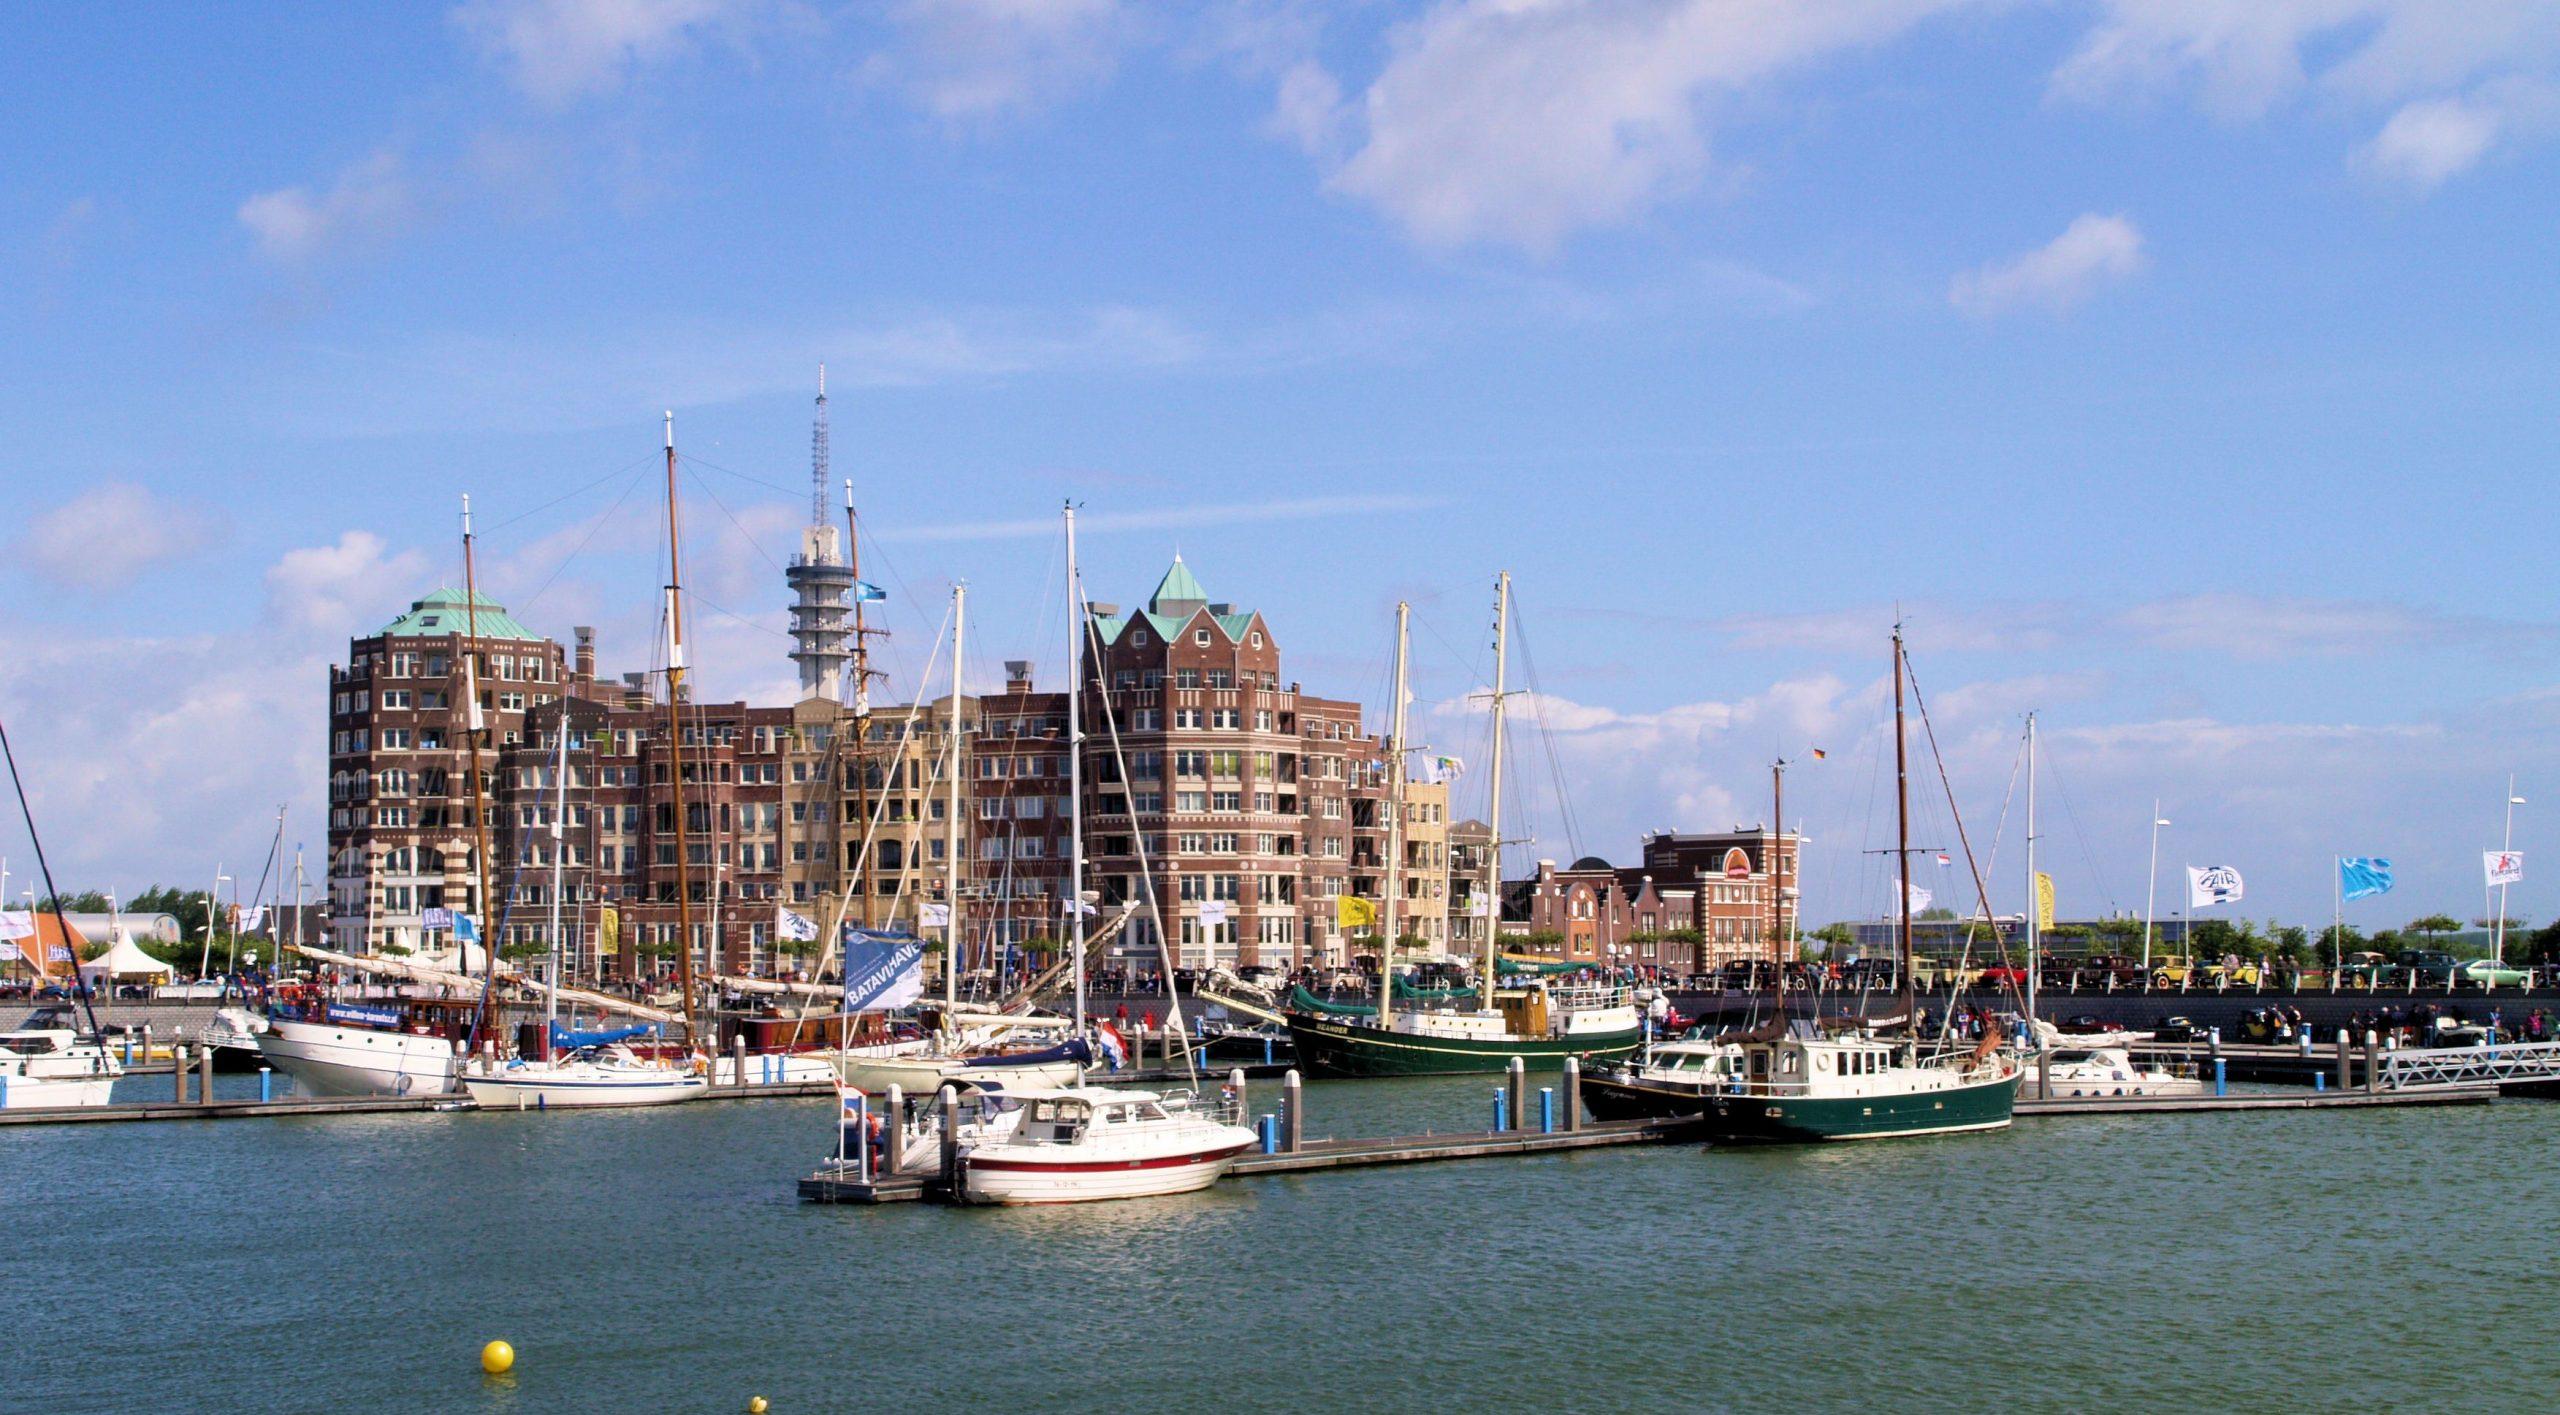 lelystad haven scaled